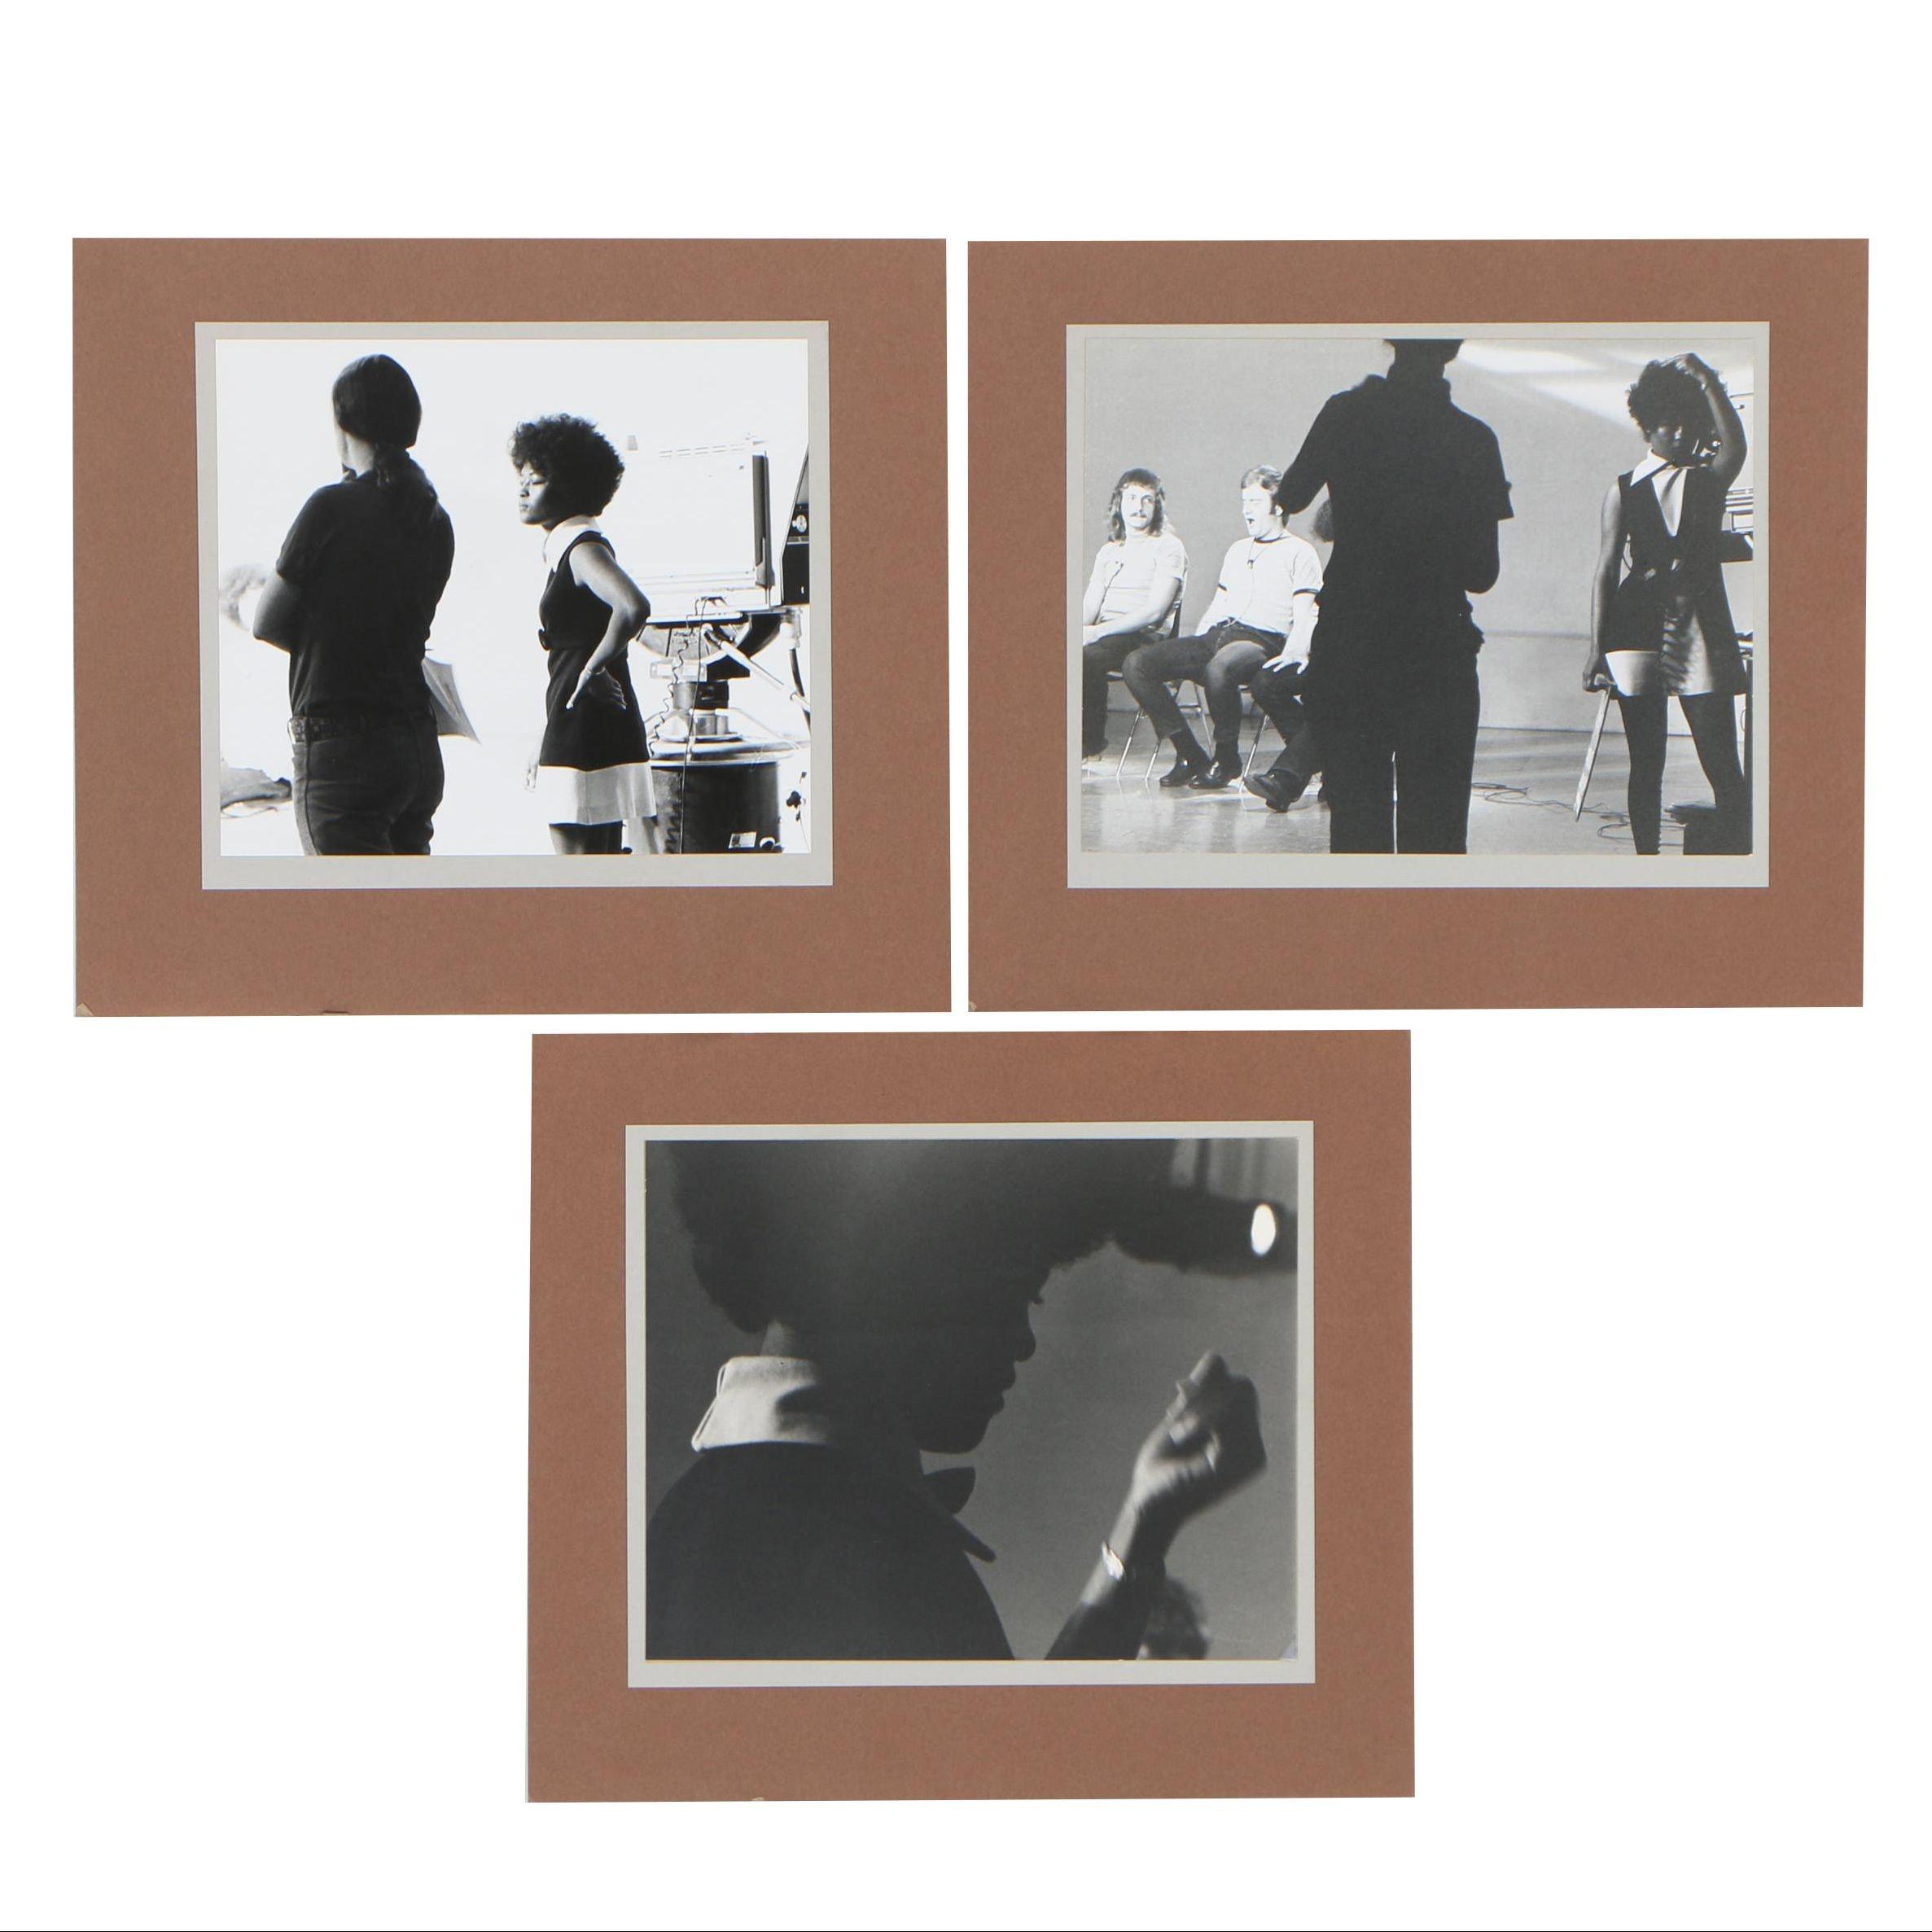 Cathal O'Toole Silver Gelatin Photographs of Film Studio